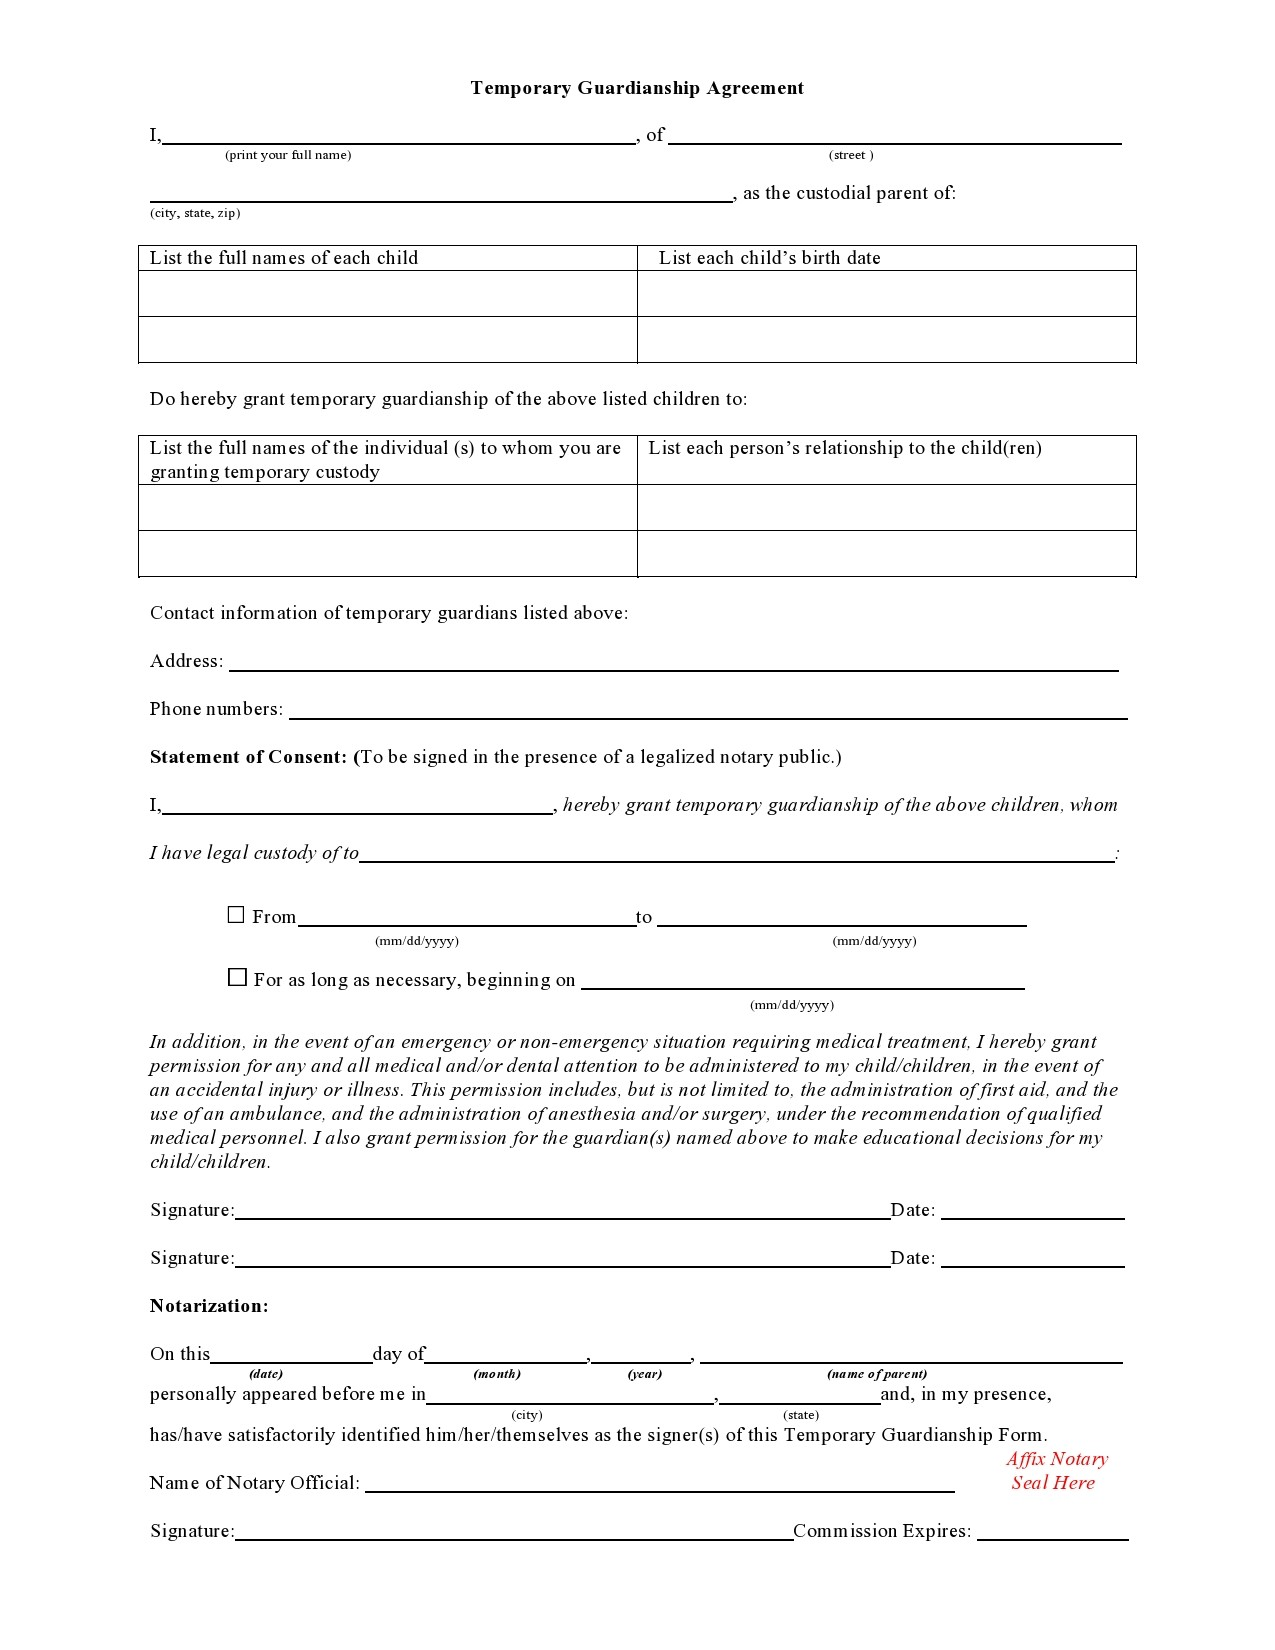 Free temporary guardianship form 01